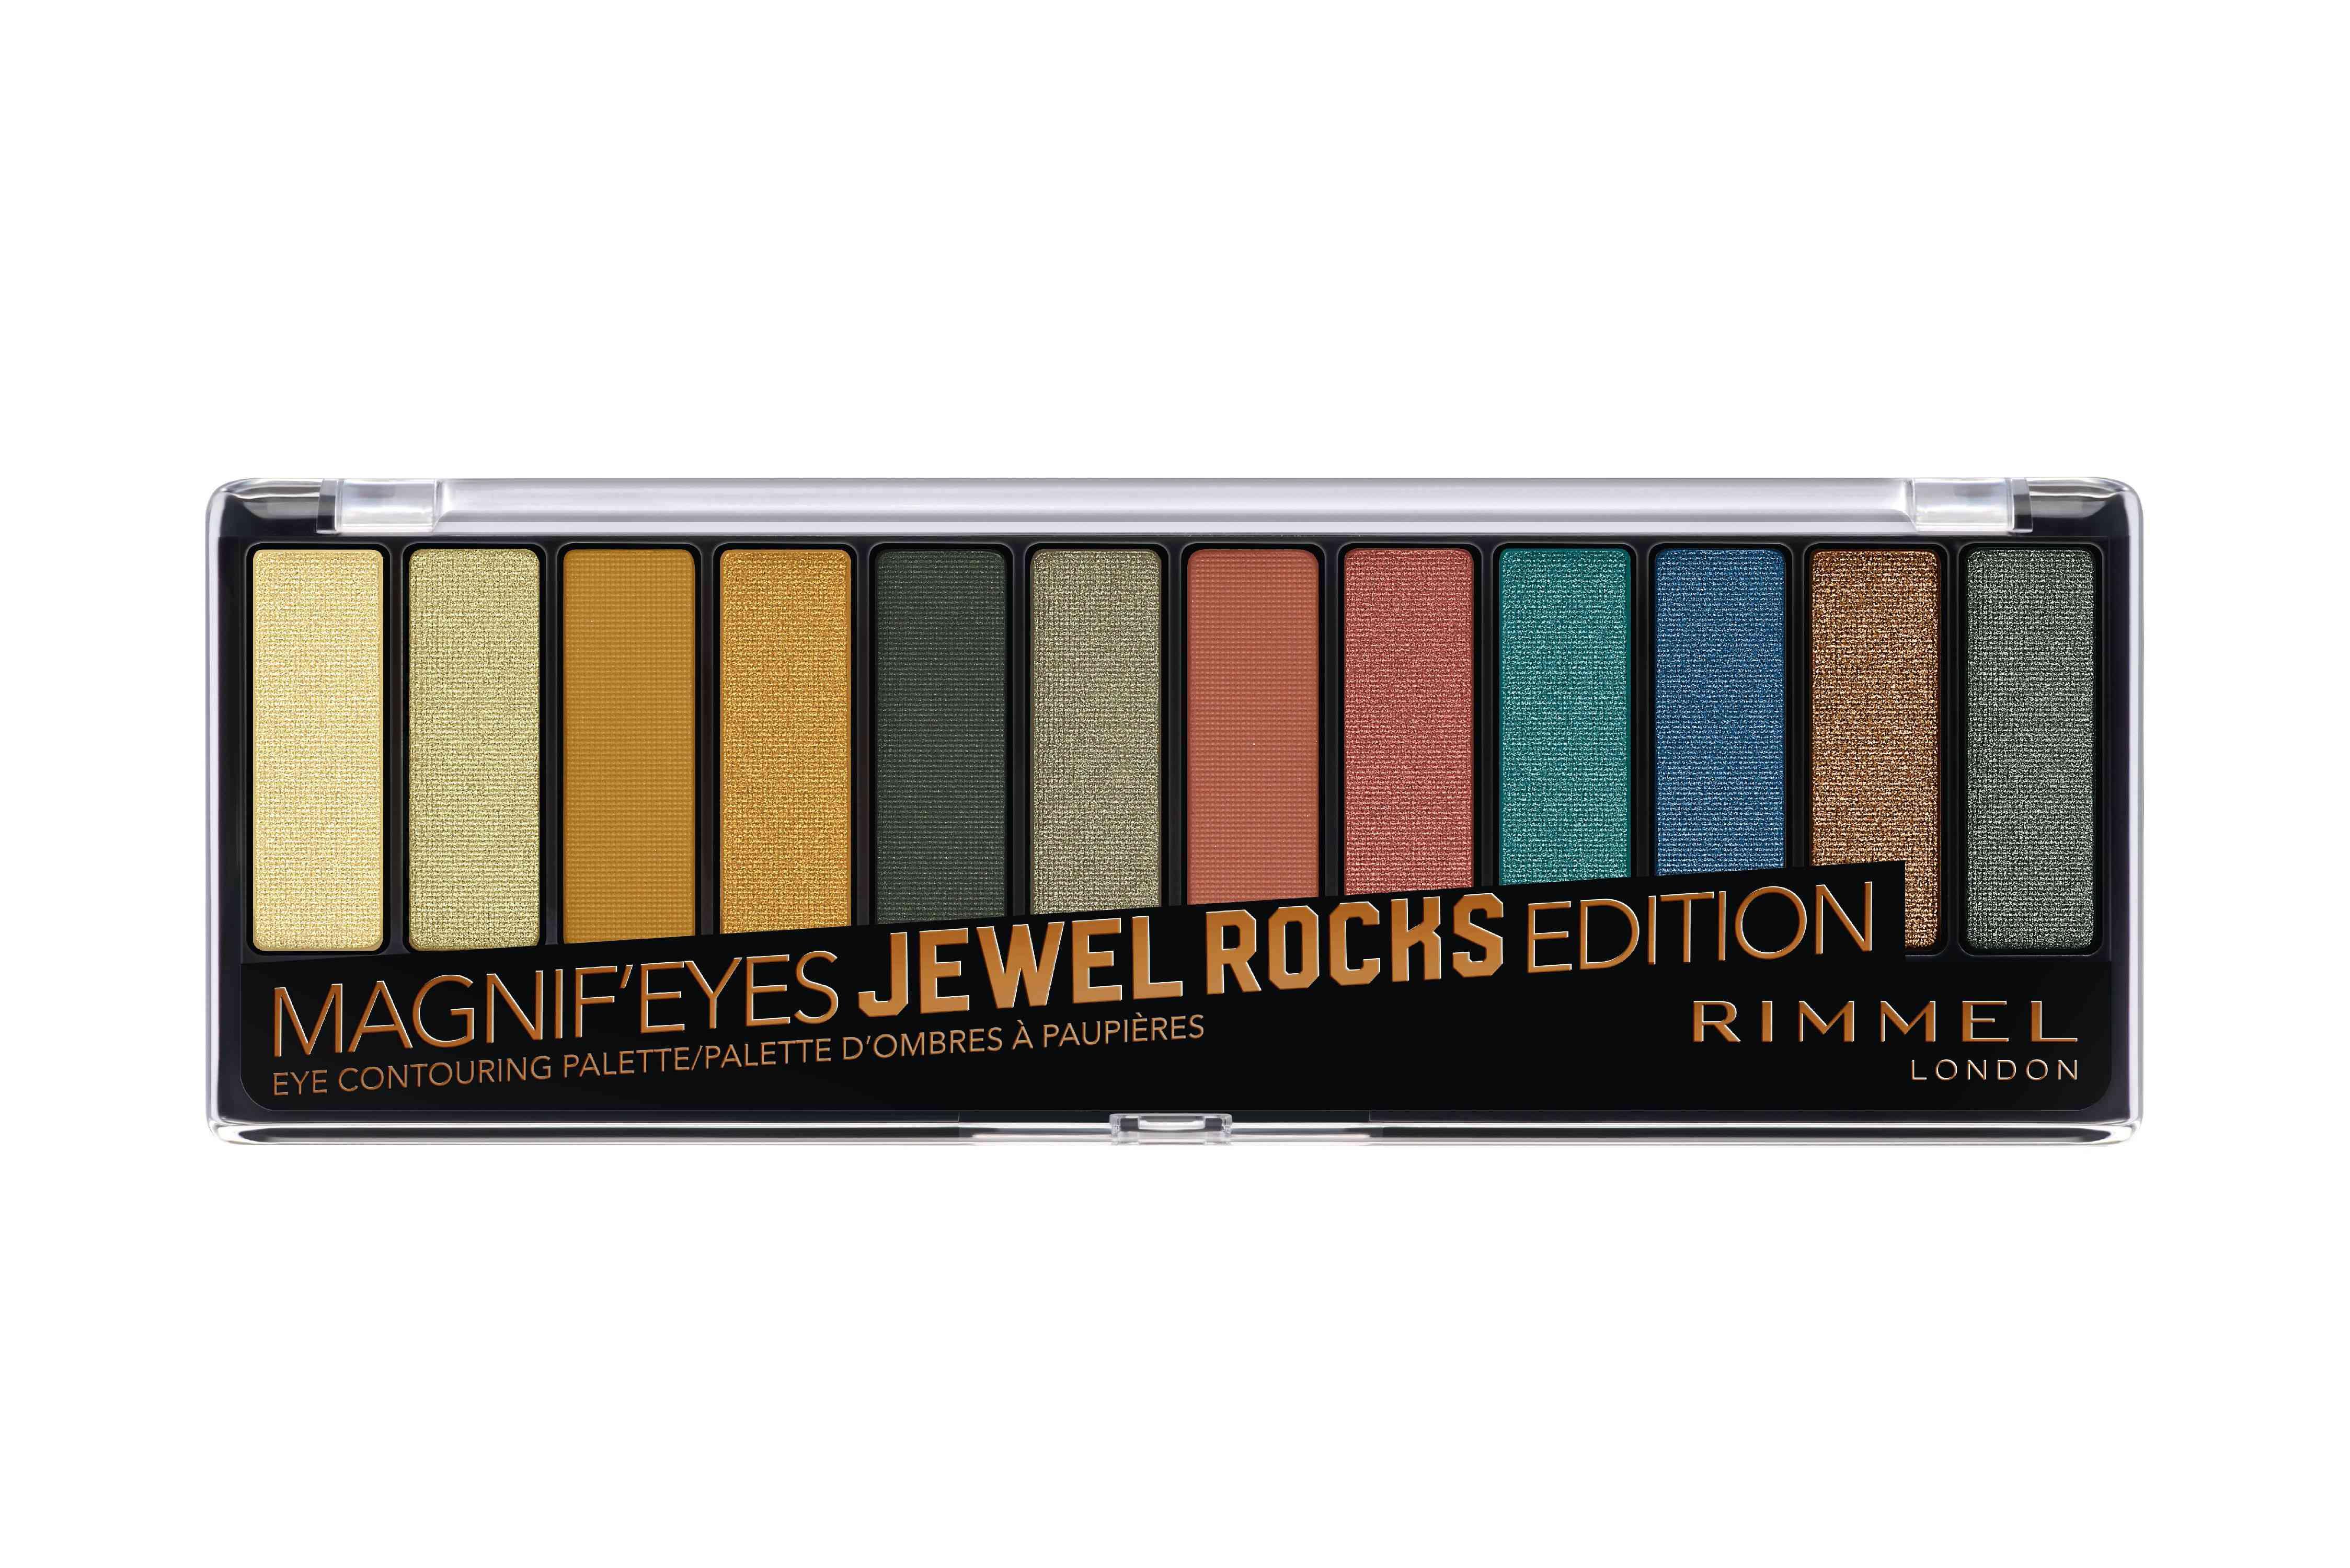 rimmel eyeshadow palette